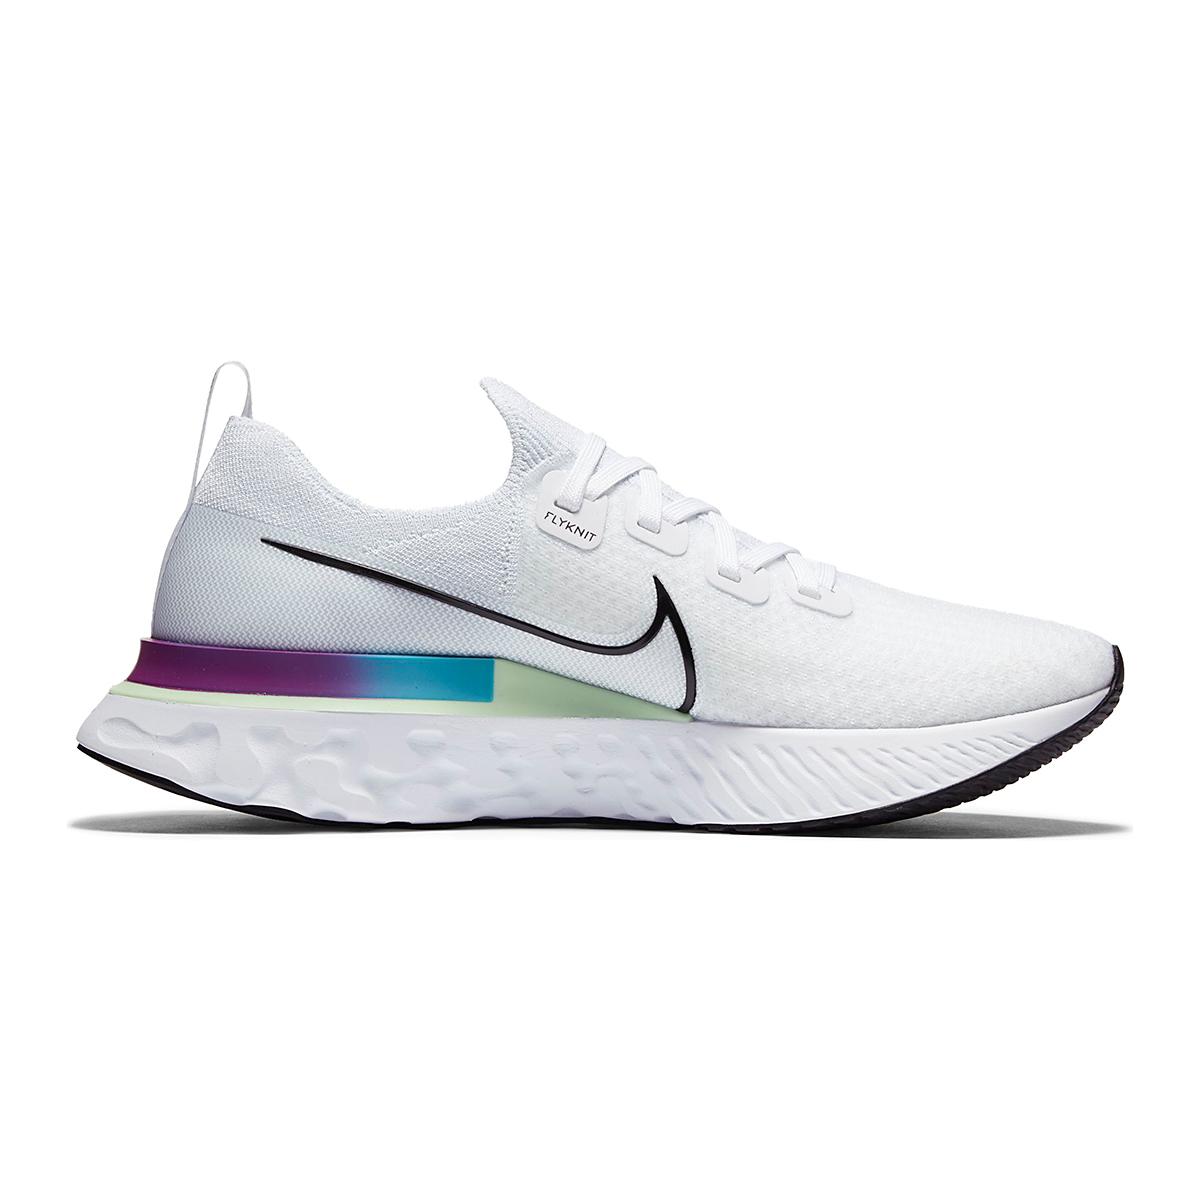 Men's Nike React Infinity Run Flyknit Running Shoes - Color: White/Vapor Green/Oracle Aqua/Black - Size: 6 - Width: Regular, White/Vapor Green/Oracle Aqua/Black, large, image 2